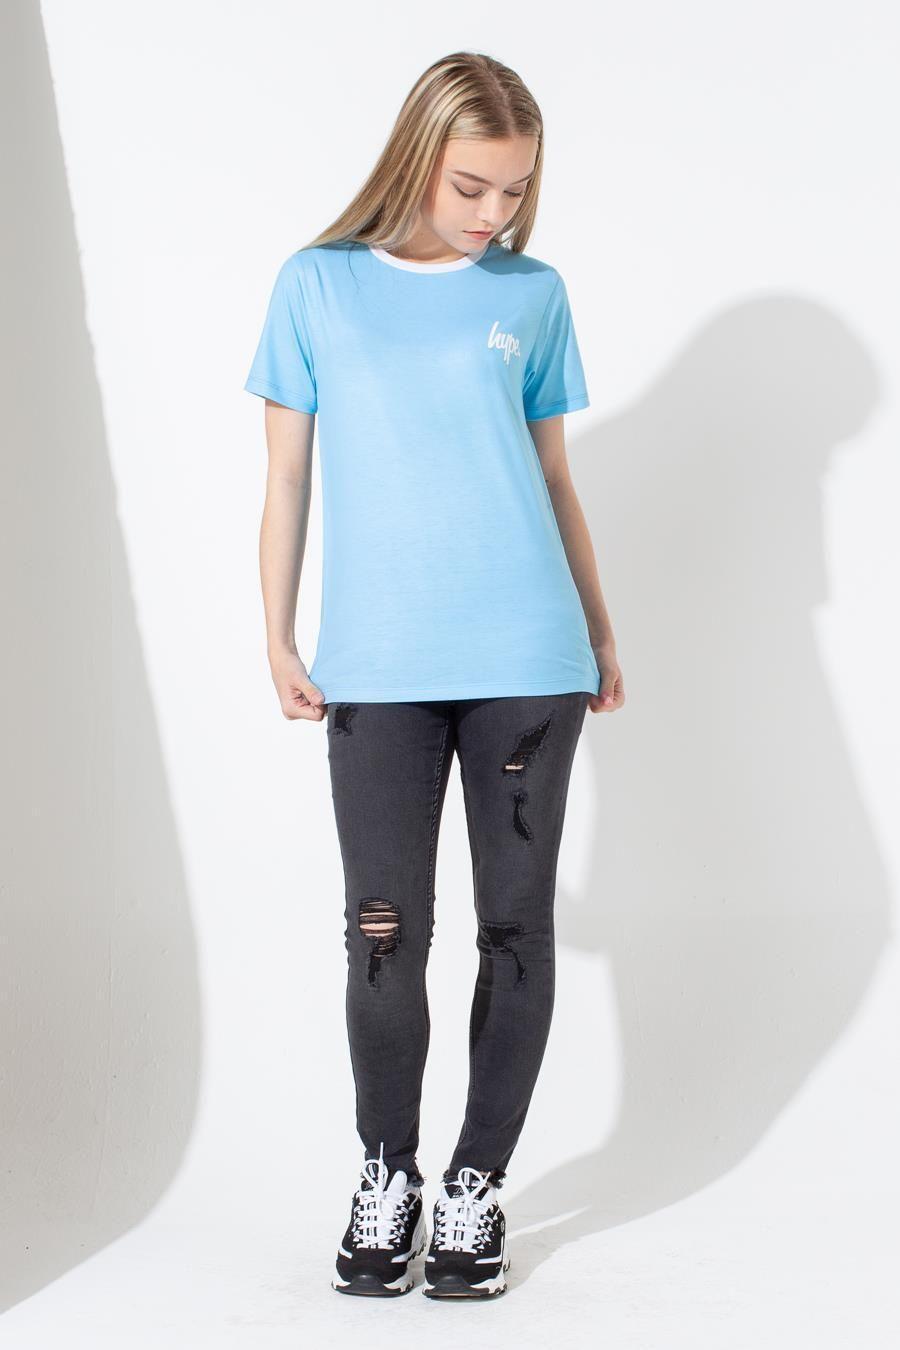 Hype Toy Story Blue Rex Ringer Kids T-Shirt